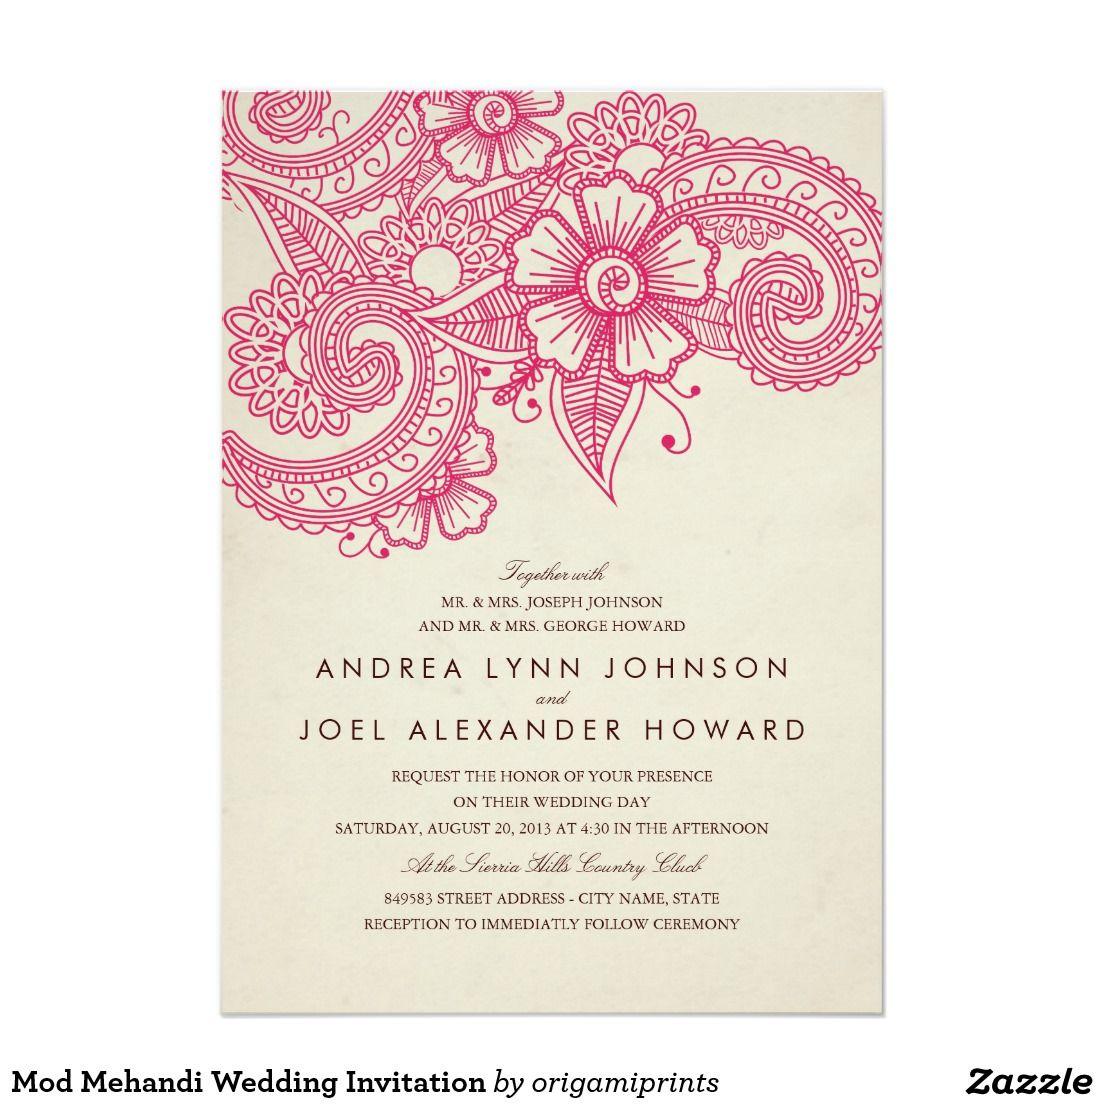 Mod Mehandi Wedding Invitation. Artwork designed by Origami Prints. Price $2.01